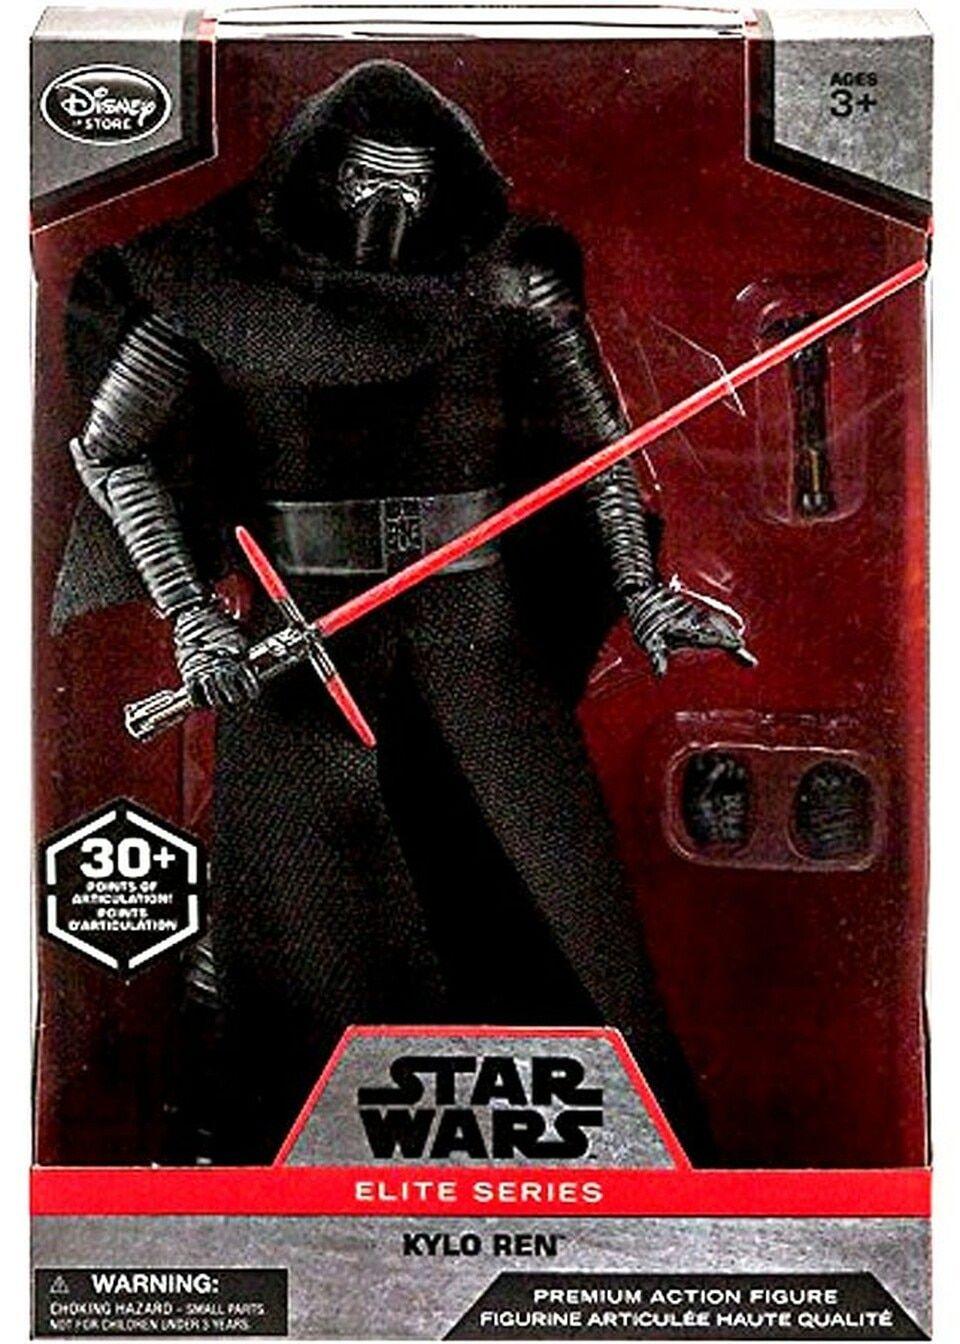 Disney Toybox Boba Fett Slave 1 Star Wars action figure /& ship Store exclusive